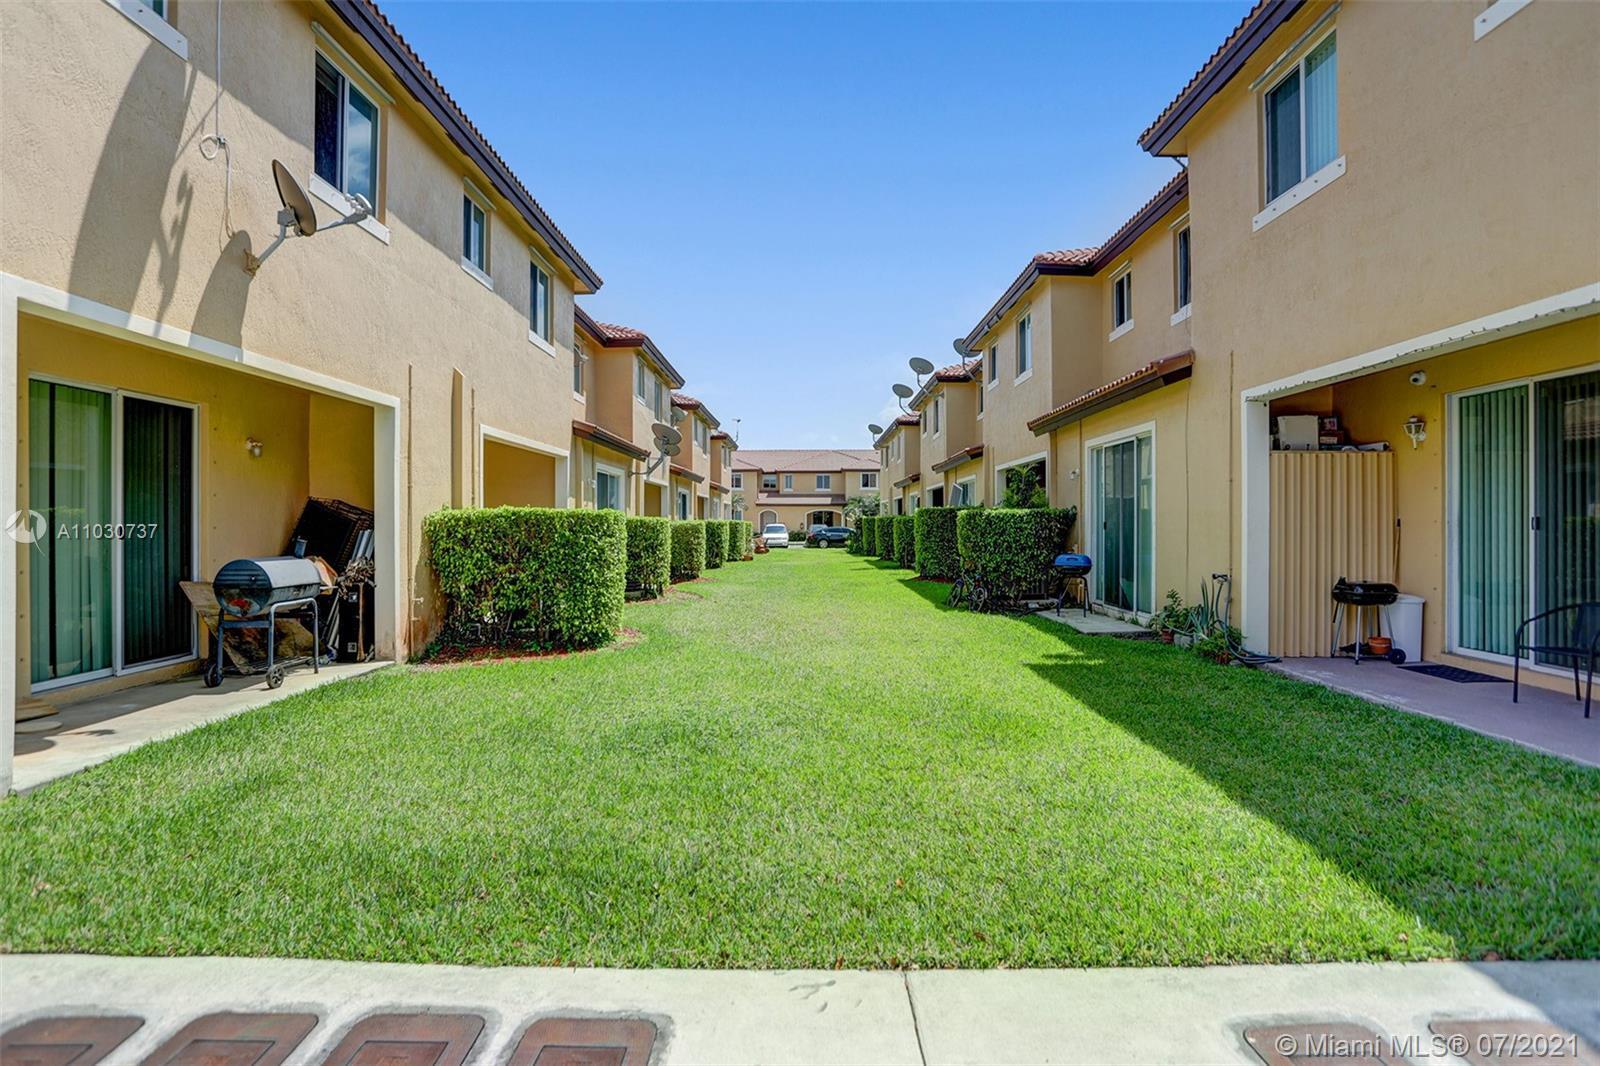 12030 268th St Unit 57, Homestead, Florida 33032